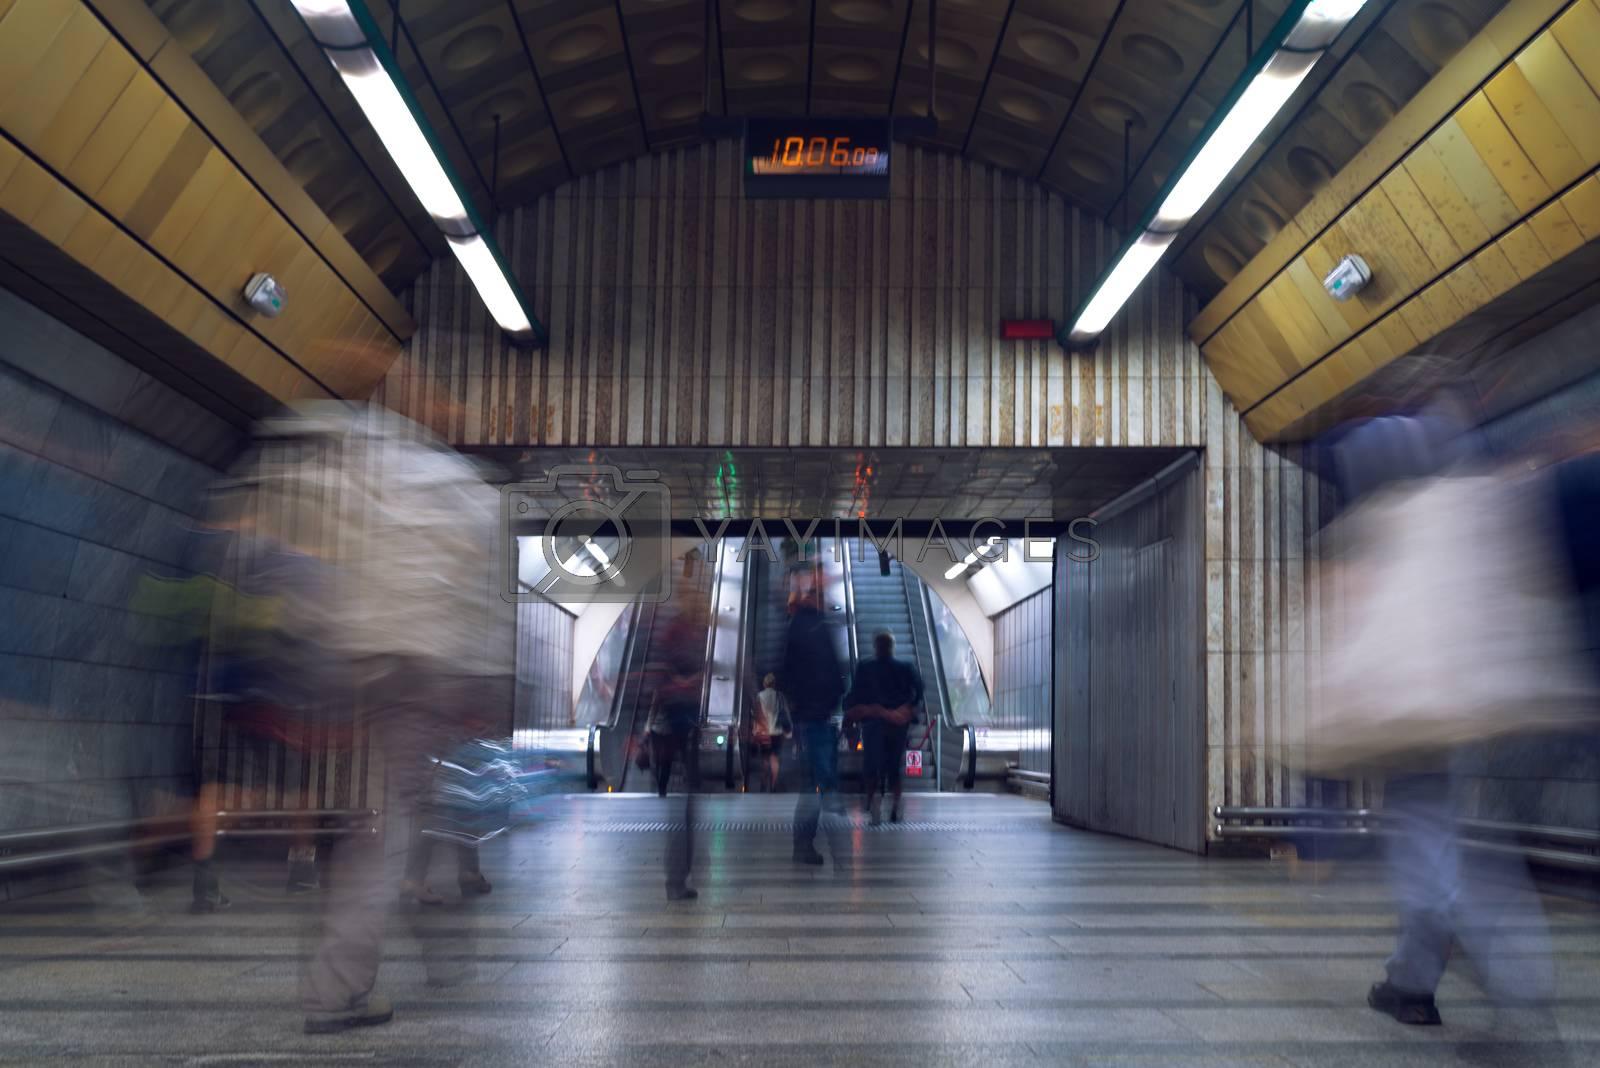 People at subway station by stevanovicigor